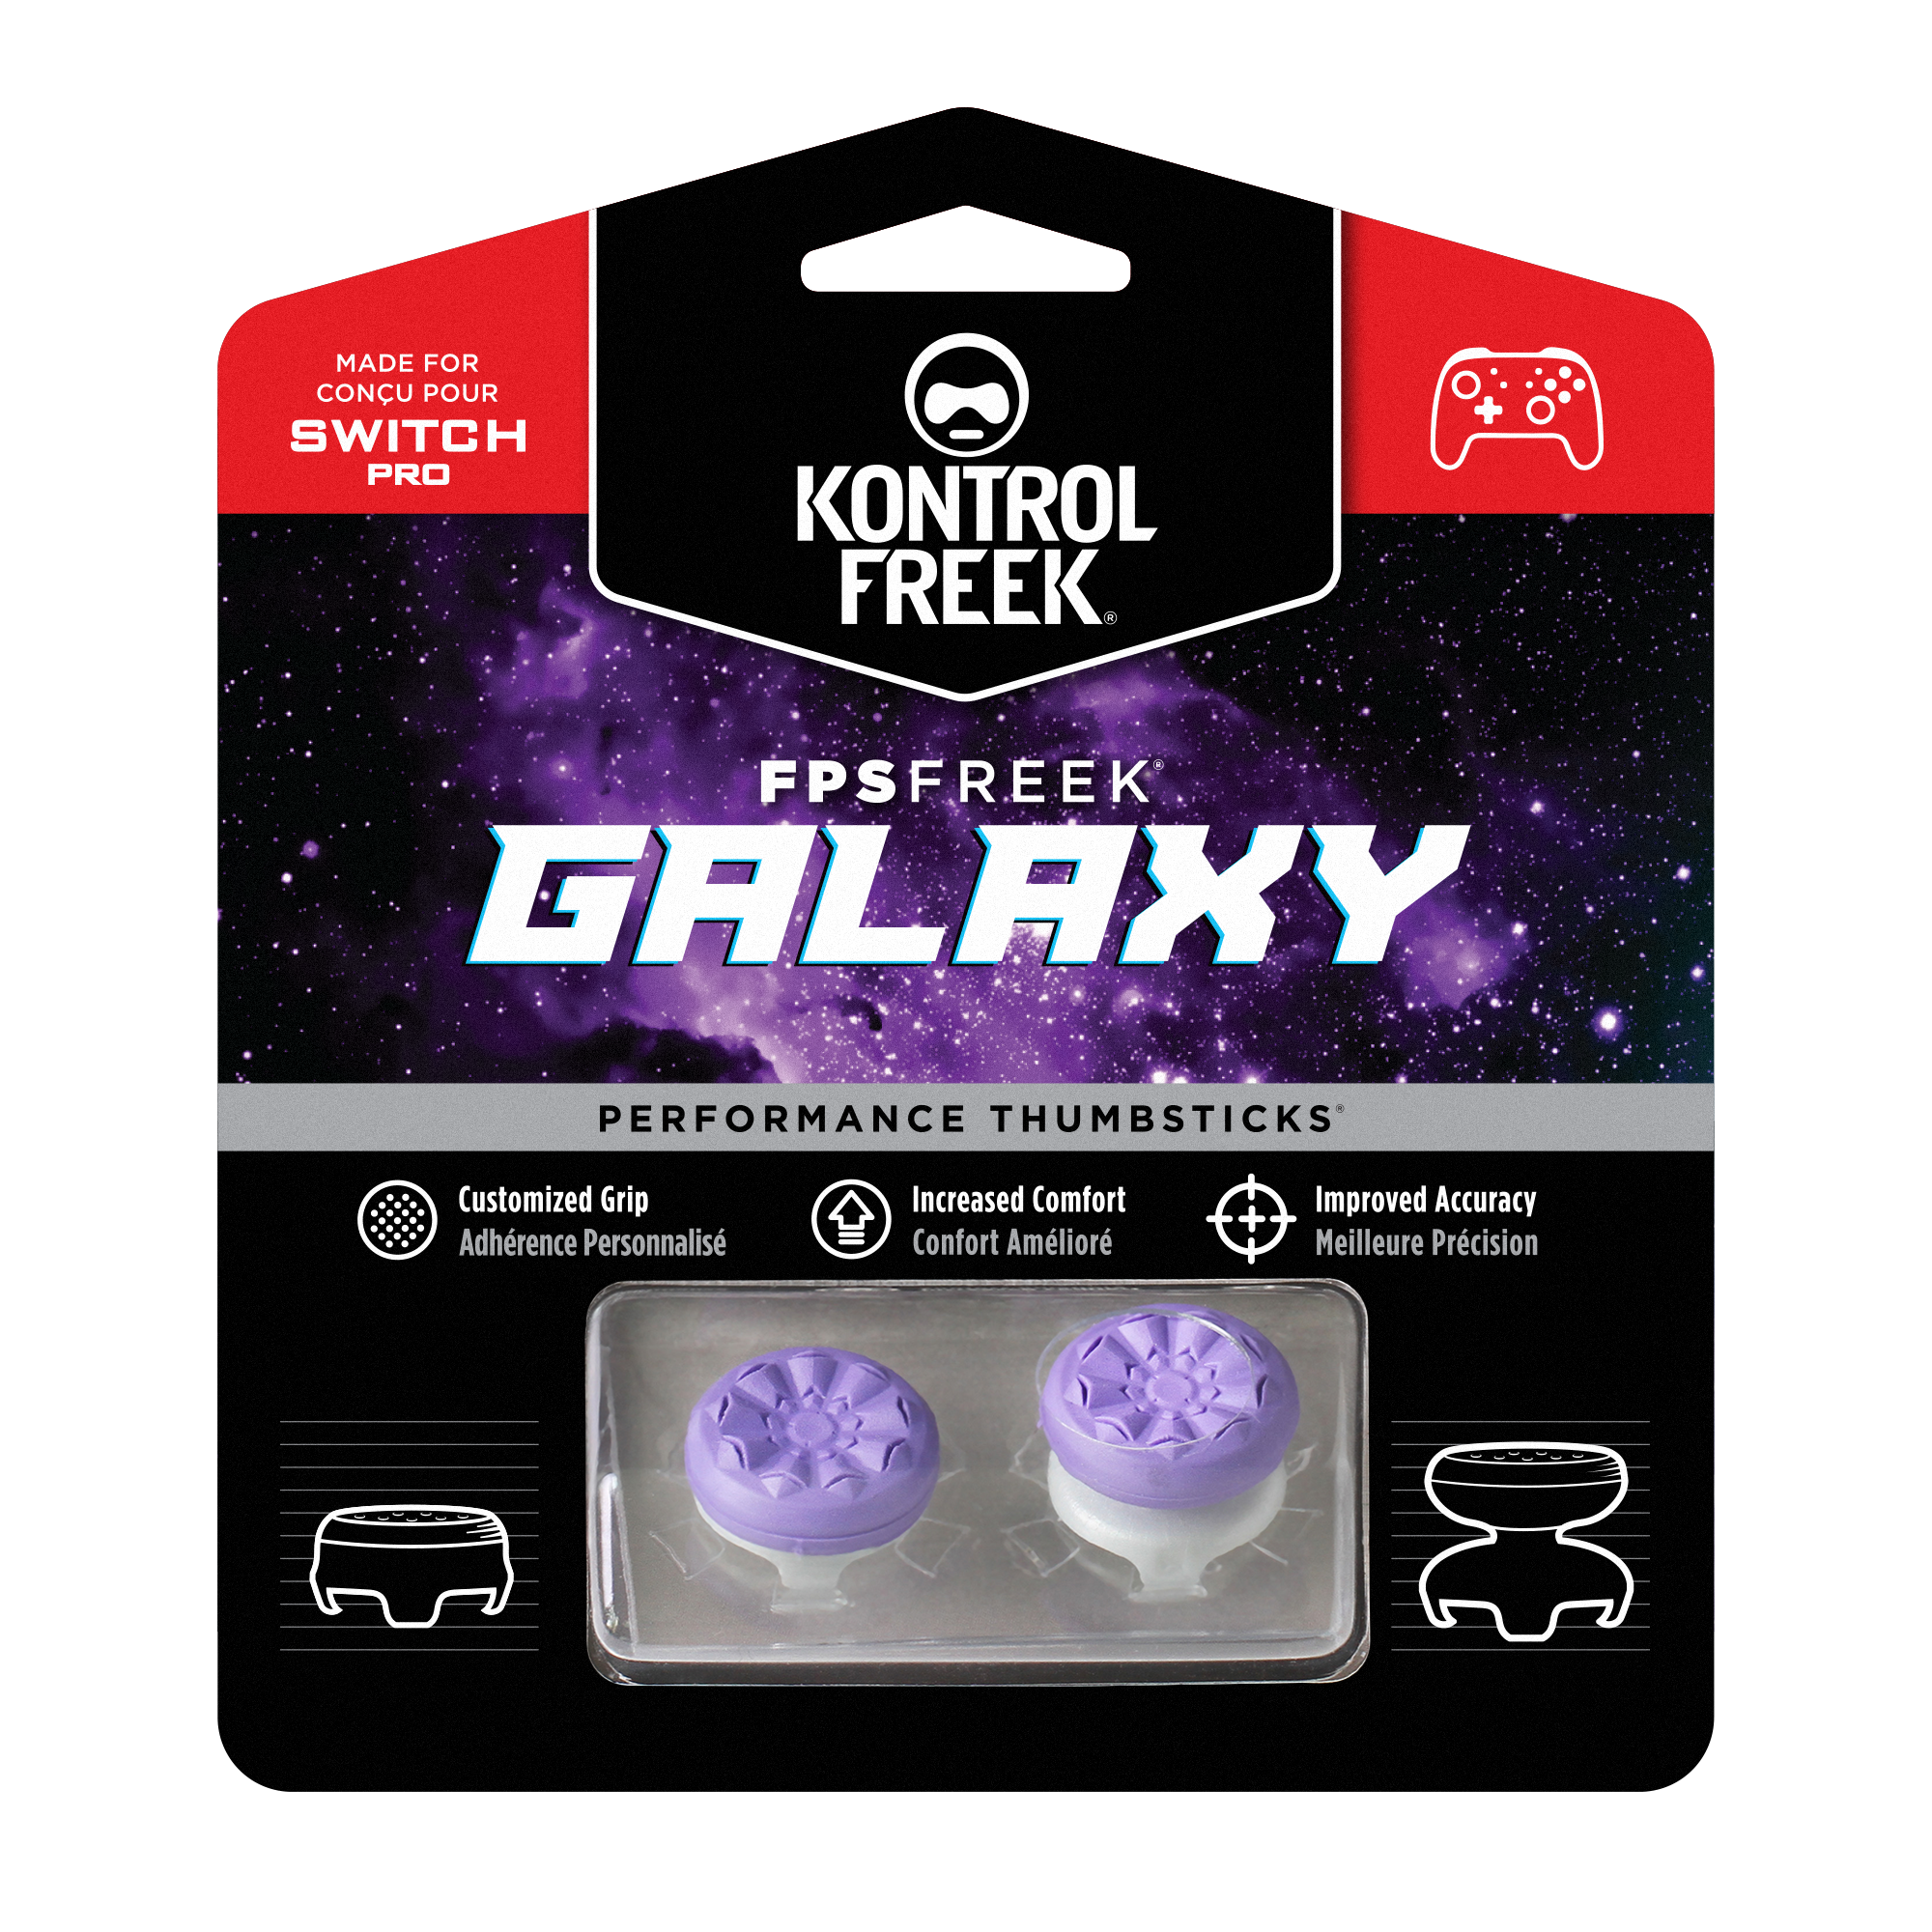 KontrolFreek Nintendo Switch Pro FPS Galaxy Inferno